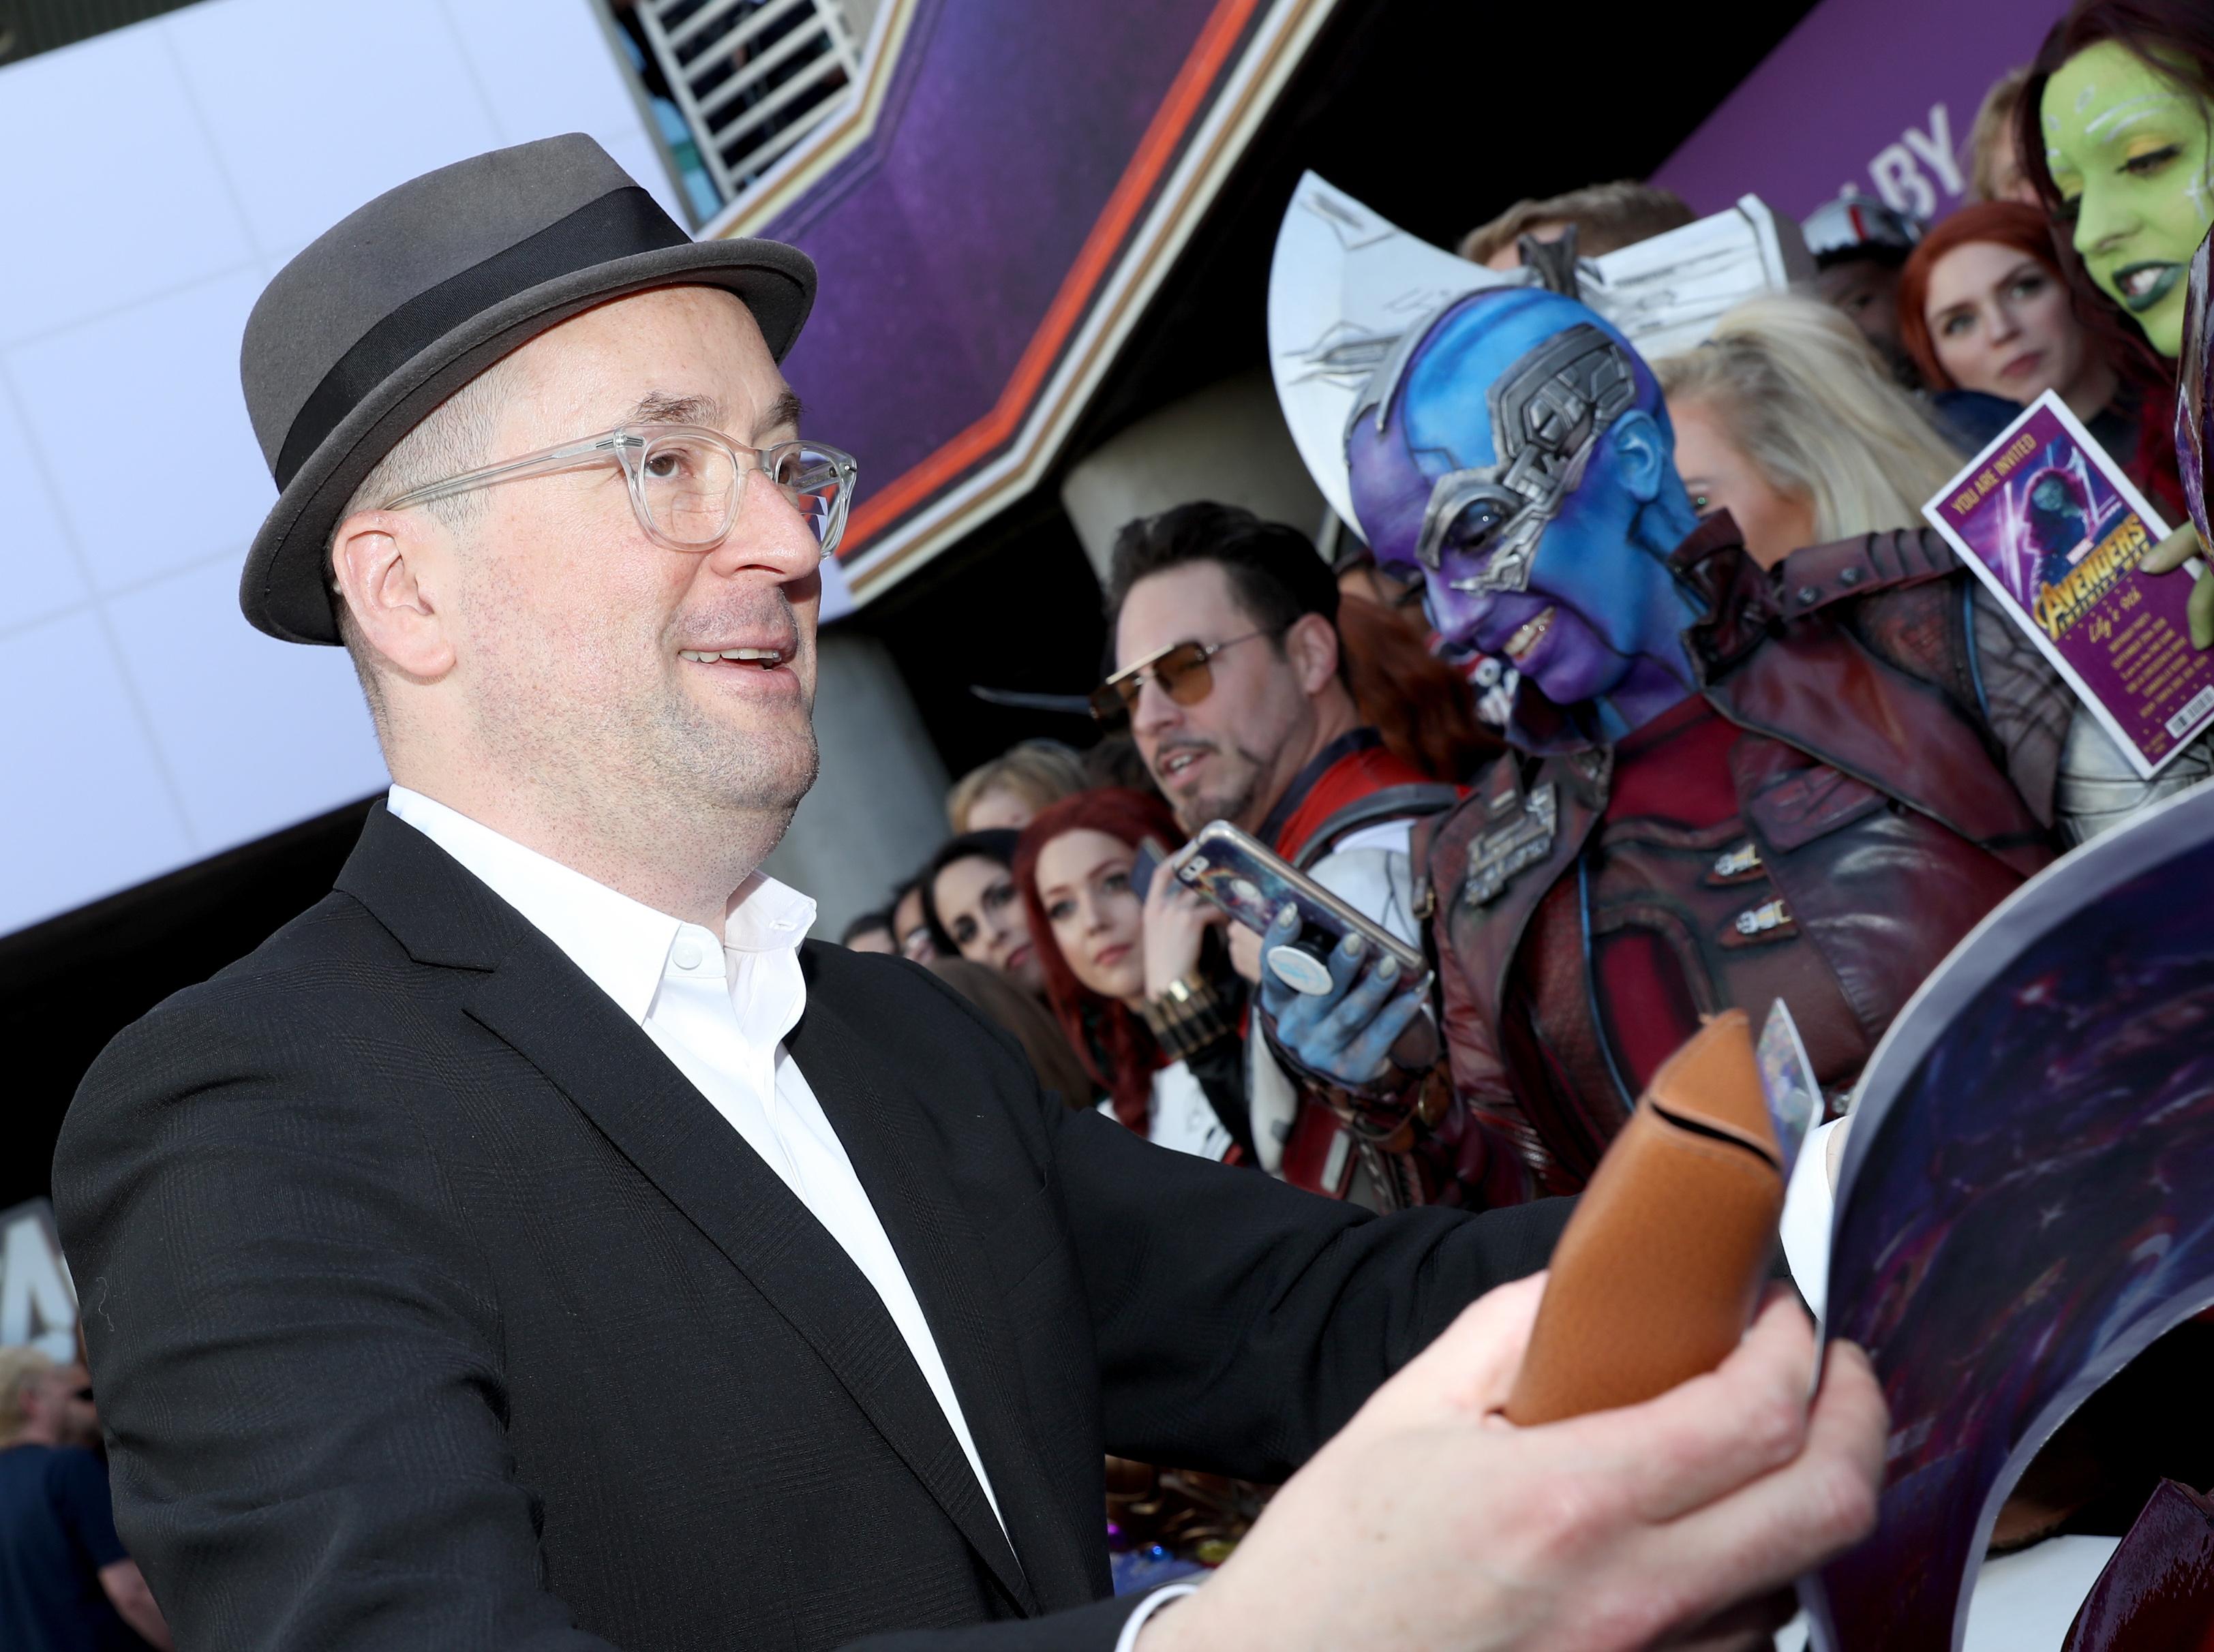 'Avengers' screenwriter Christopher Markus returns home ...